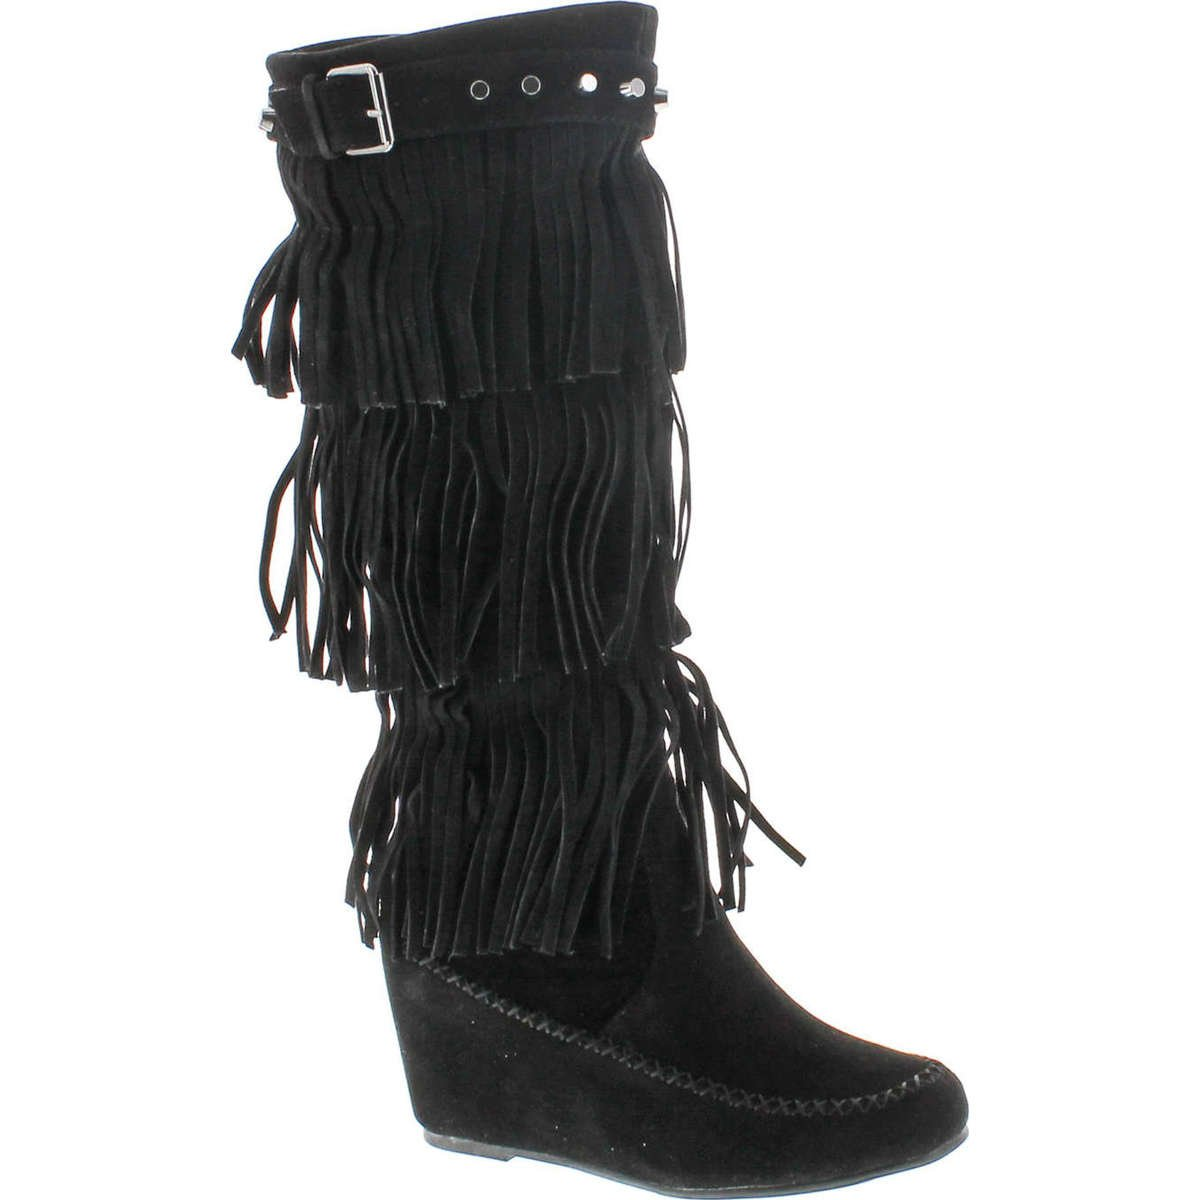 Nature Breeze Womens Bridget-02Hi Suede Fringe Studded Moccasin Knee High Wedge Boot,Black,9